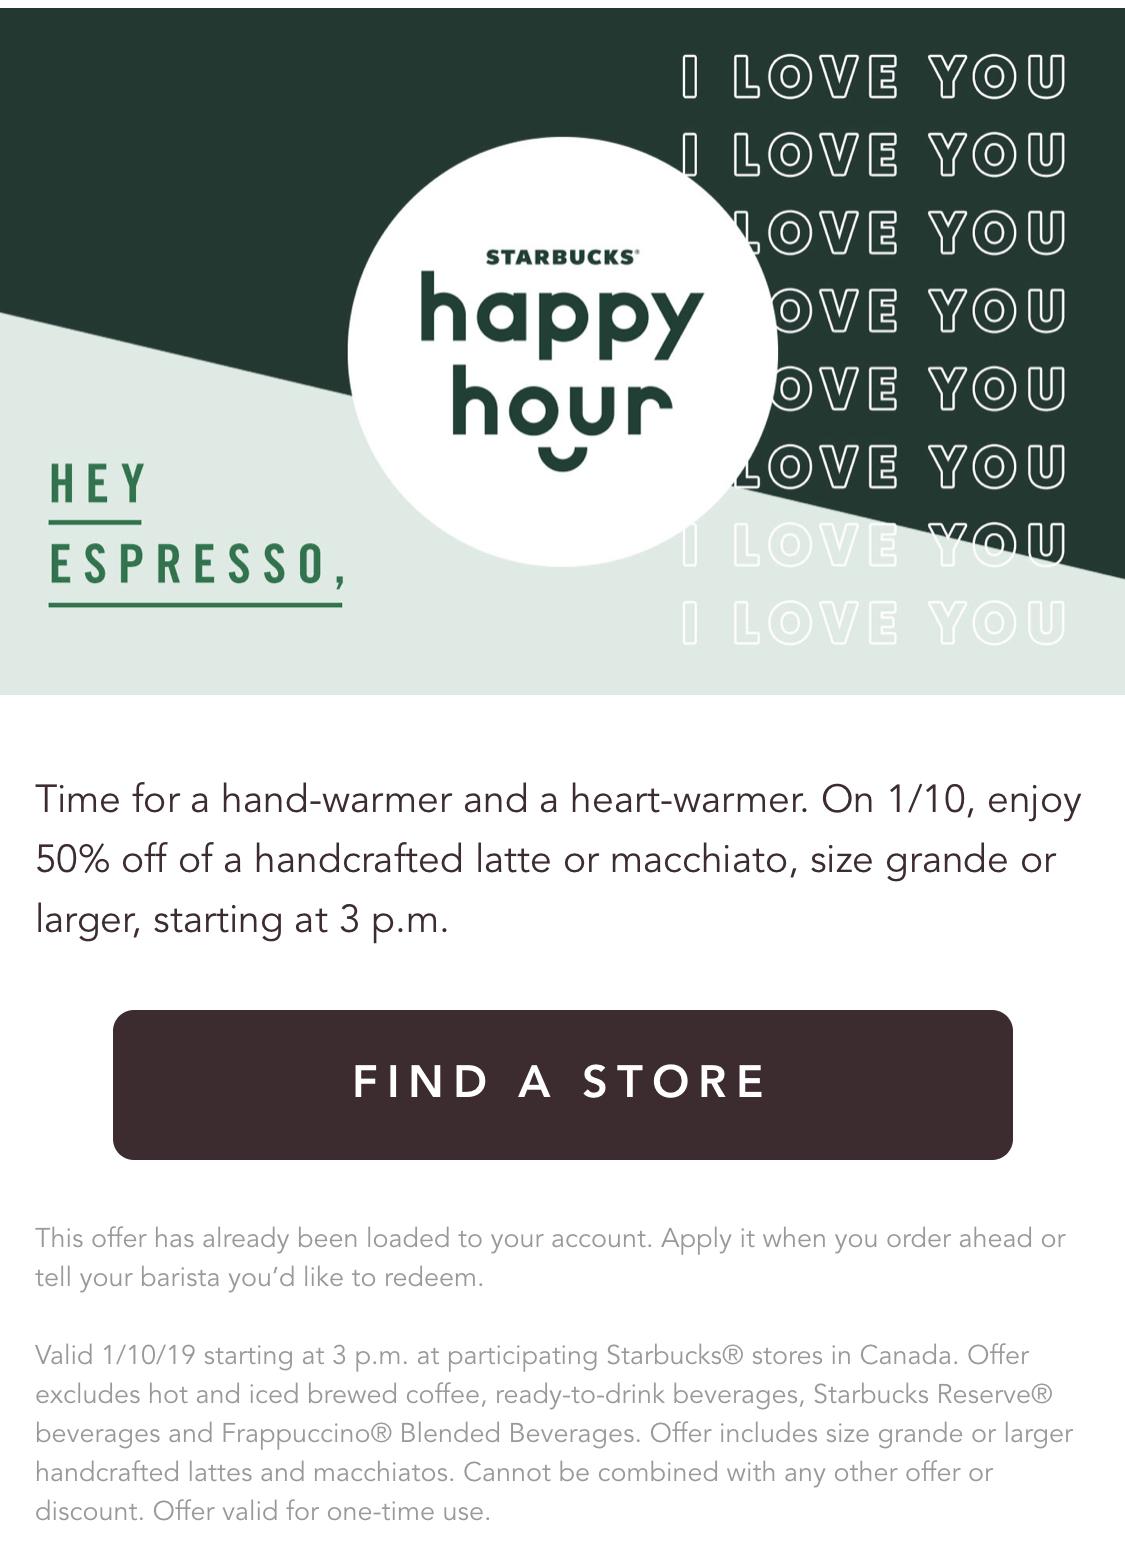 Starbucks:任何Latte/Macchiato可享半價優惠 (只限Starbucks會員)